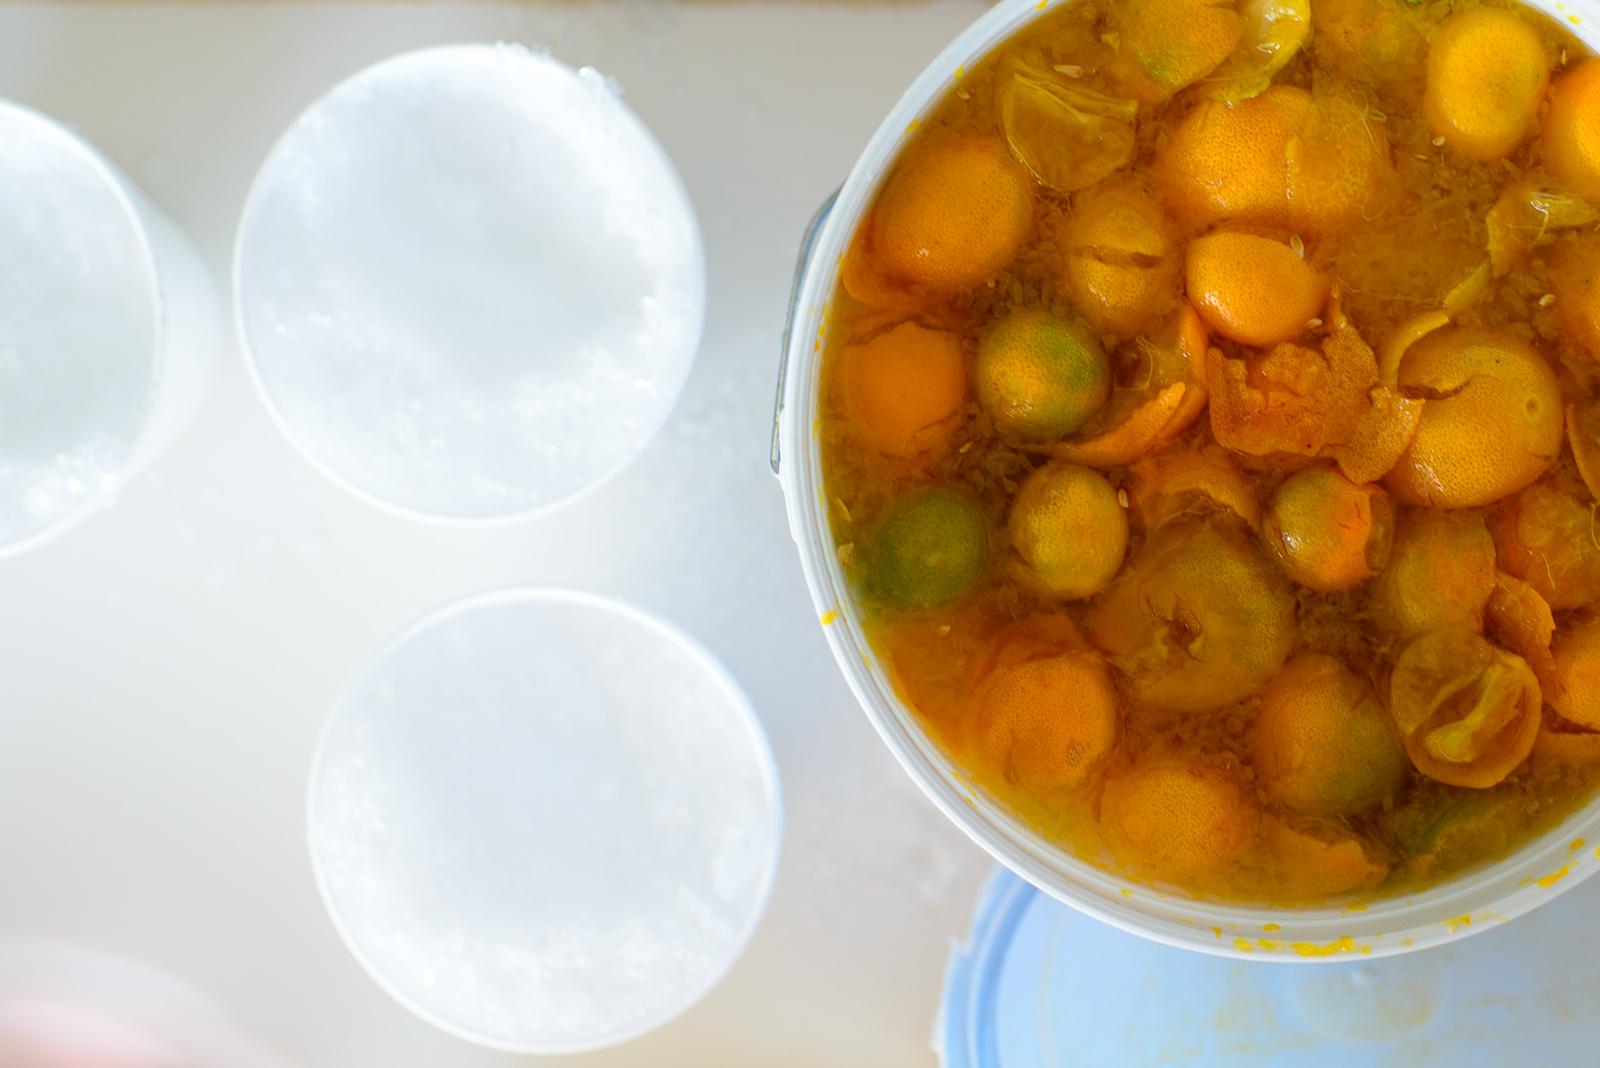 Naranjitas, small bitter oranges